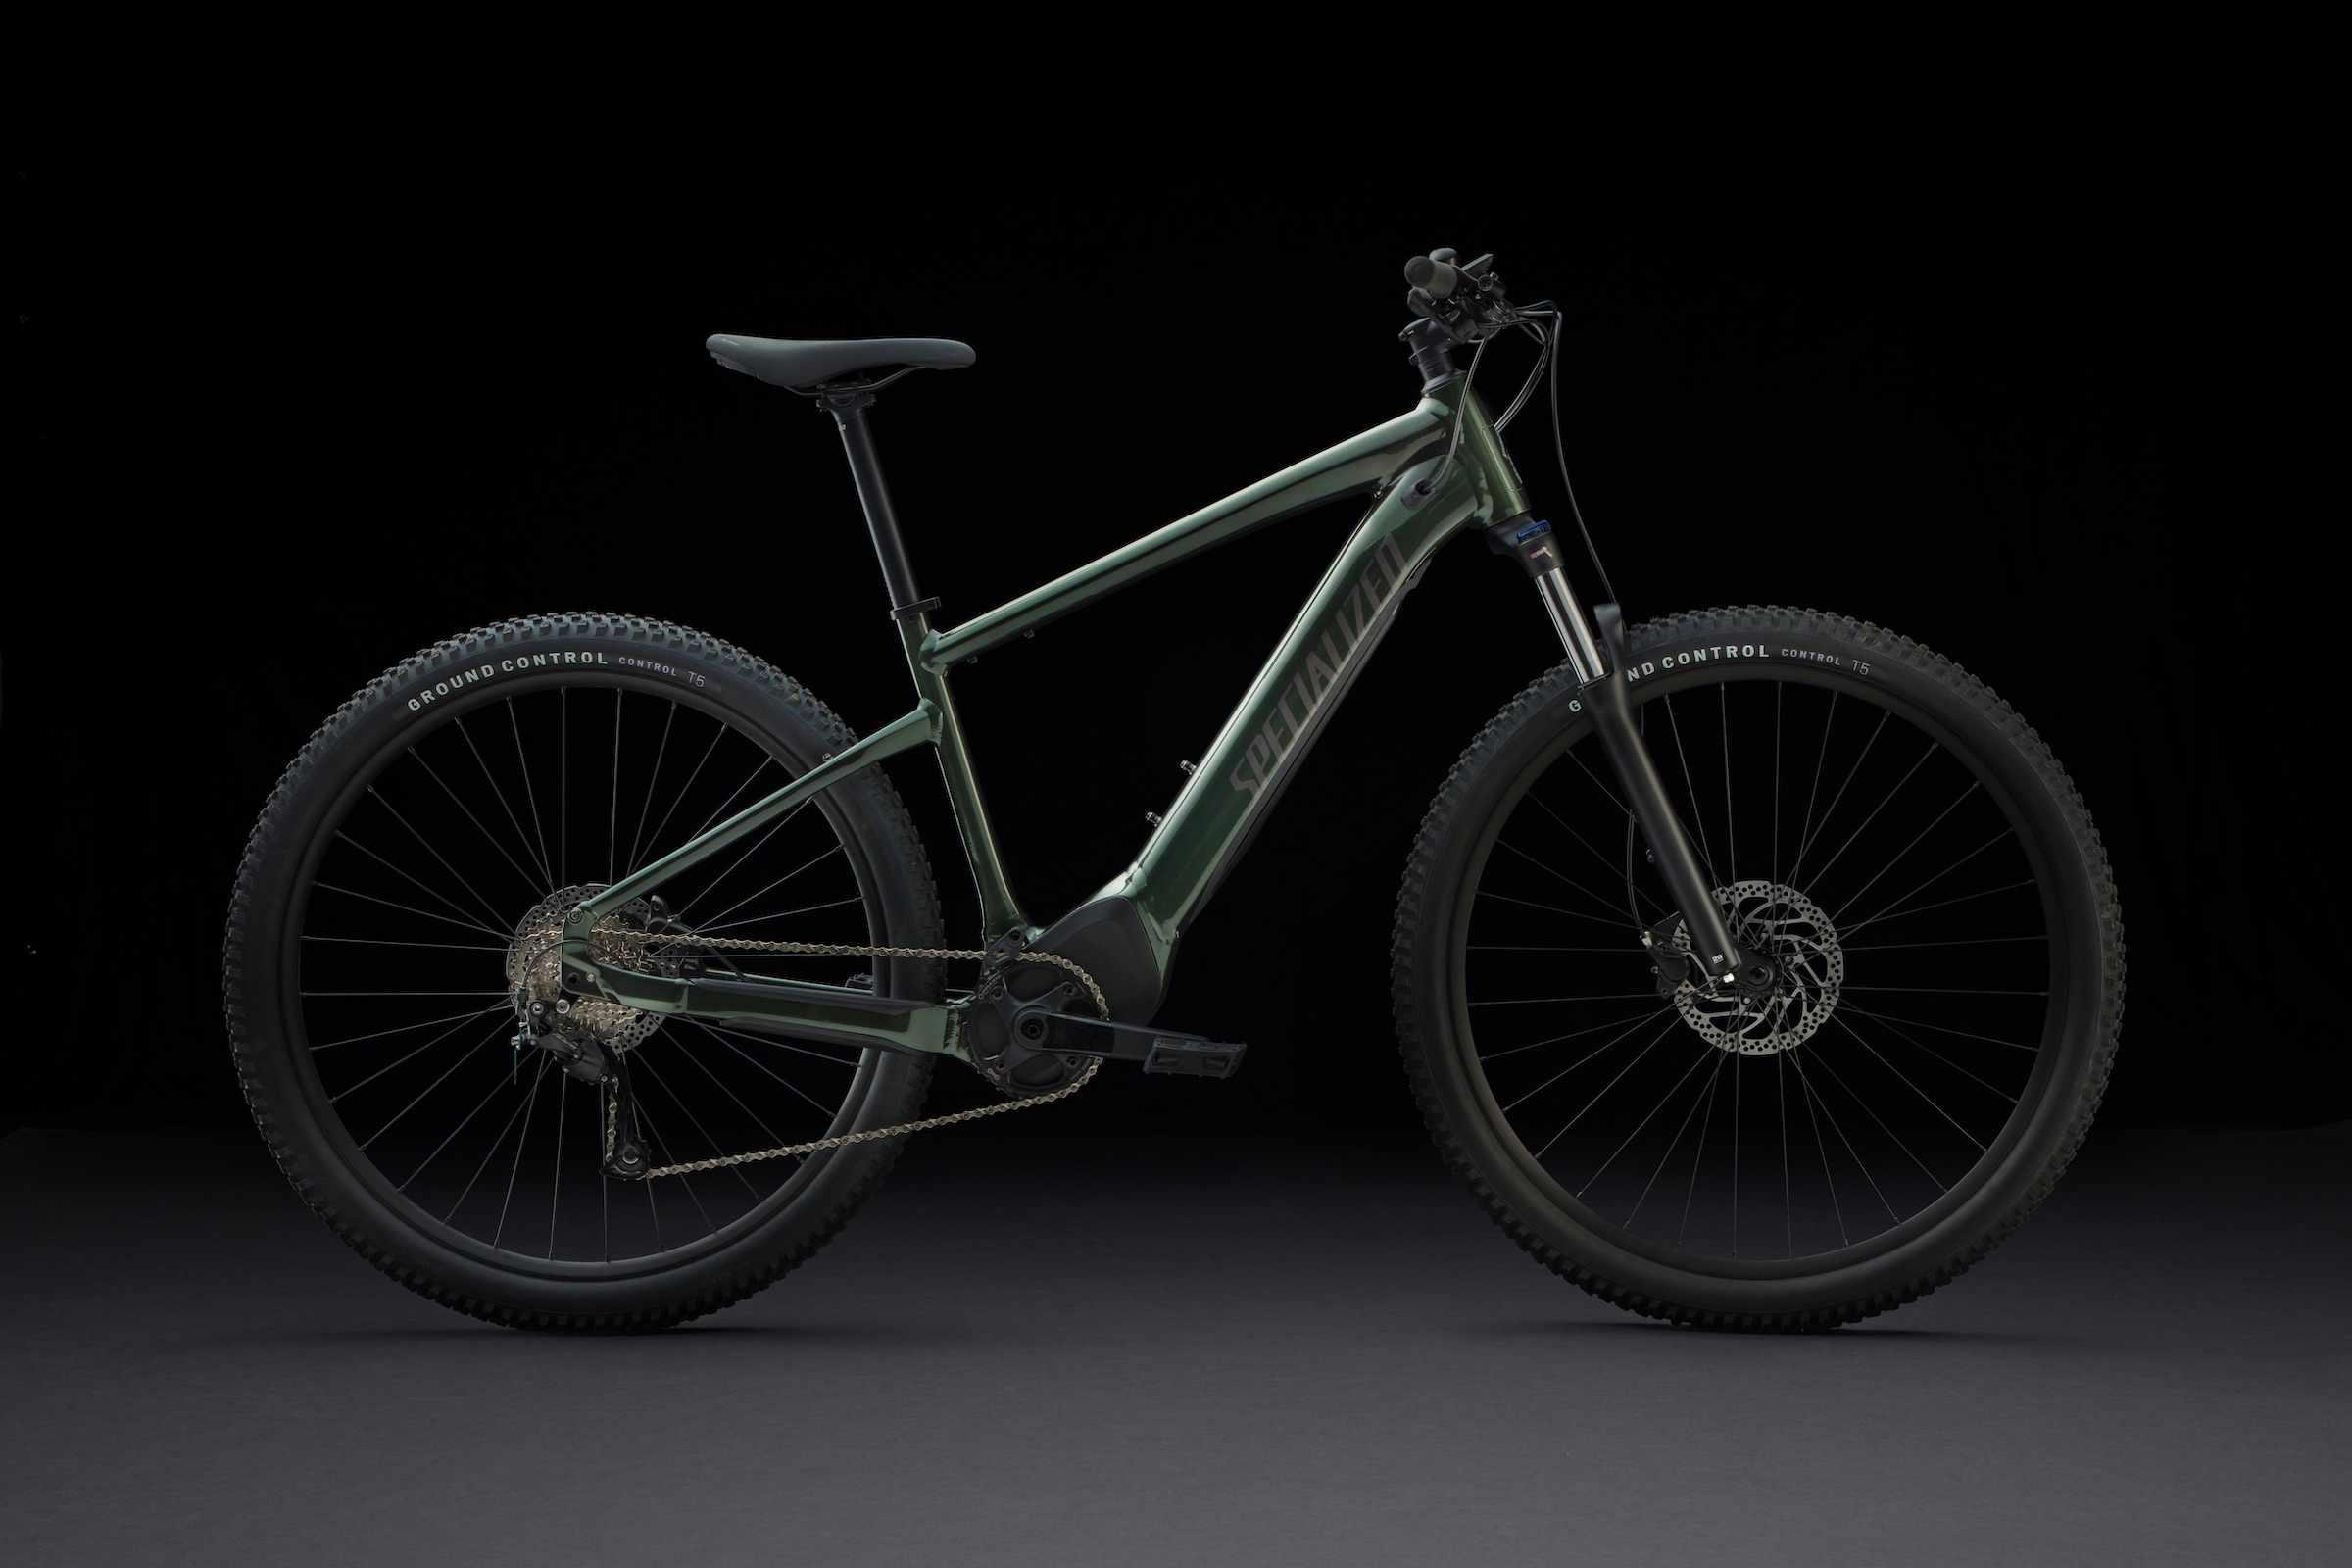 2022 Specialized Turbo bike range | Price, specs, models and more -  BikeRadar